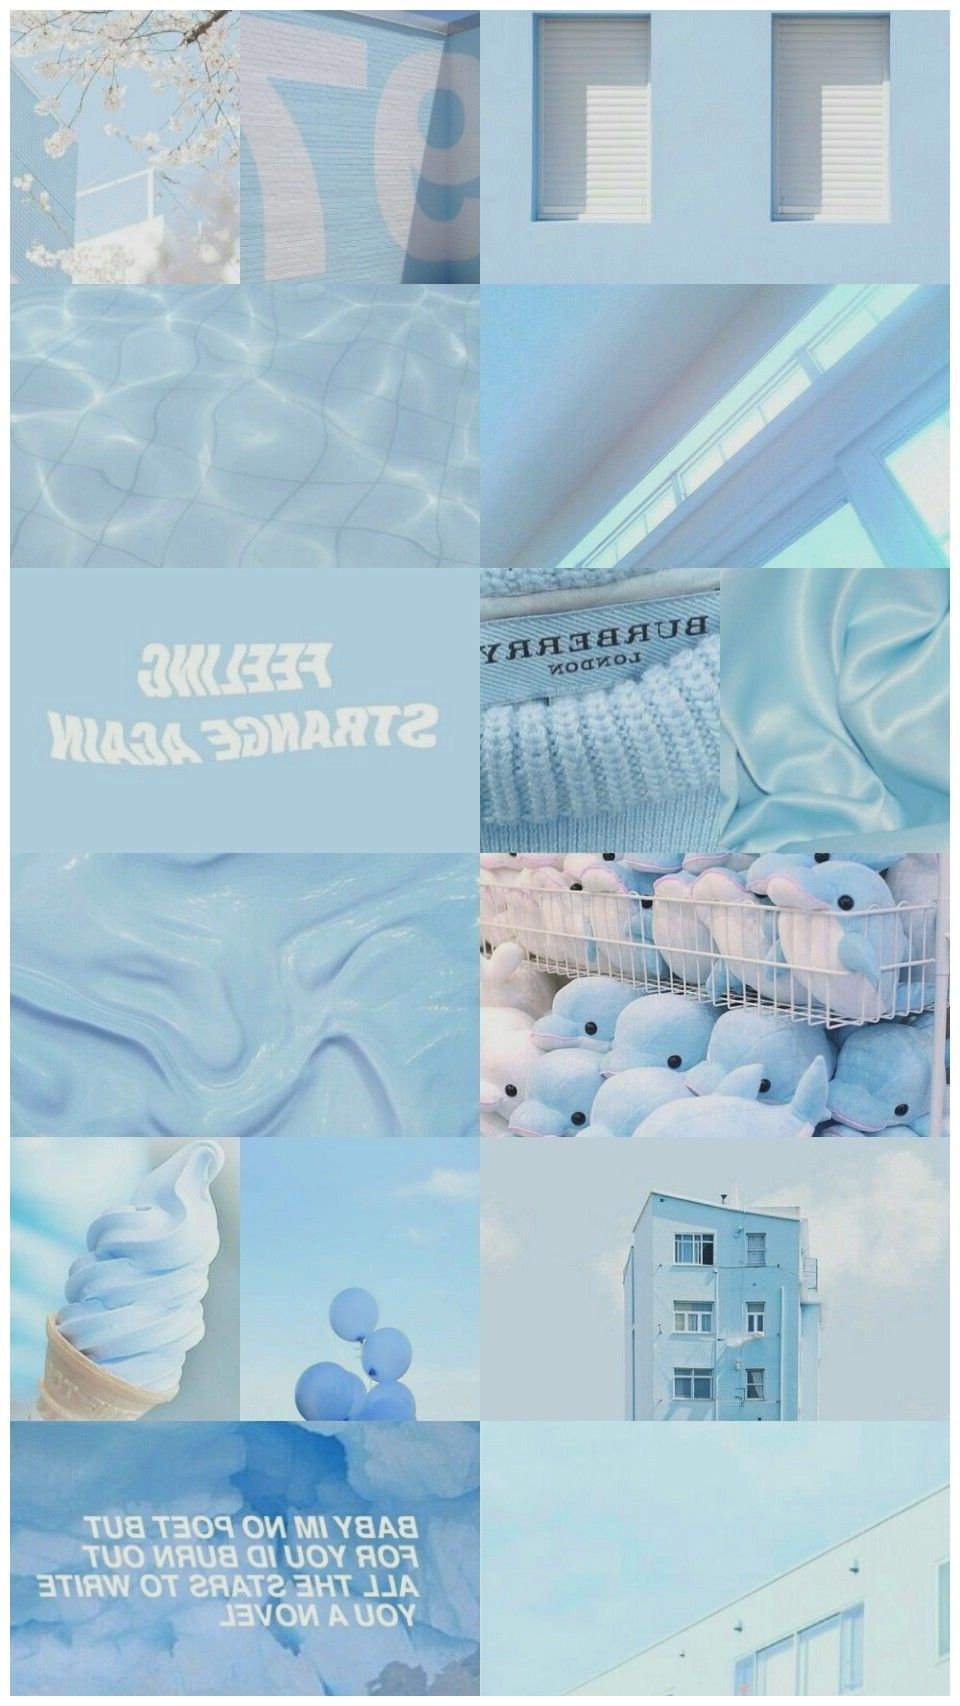 Pastel Aesthetic Wallpaper Estetika Biru Warna Aqua Biru